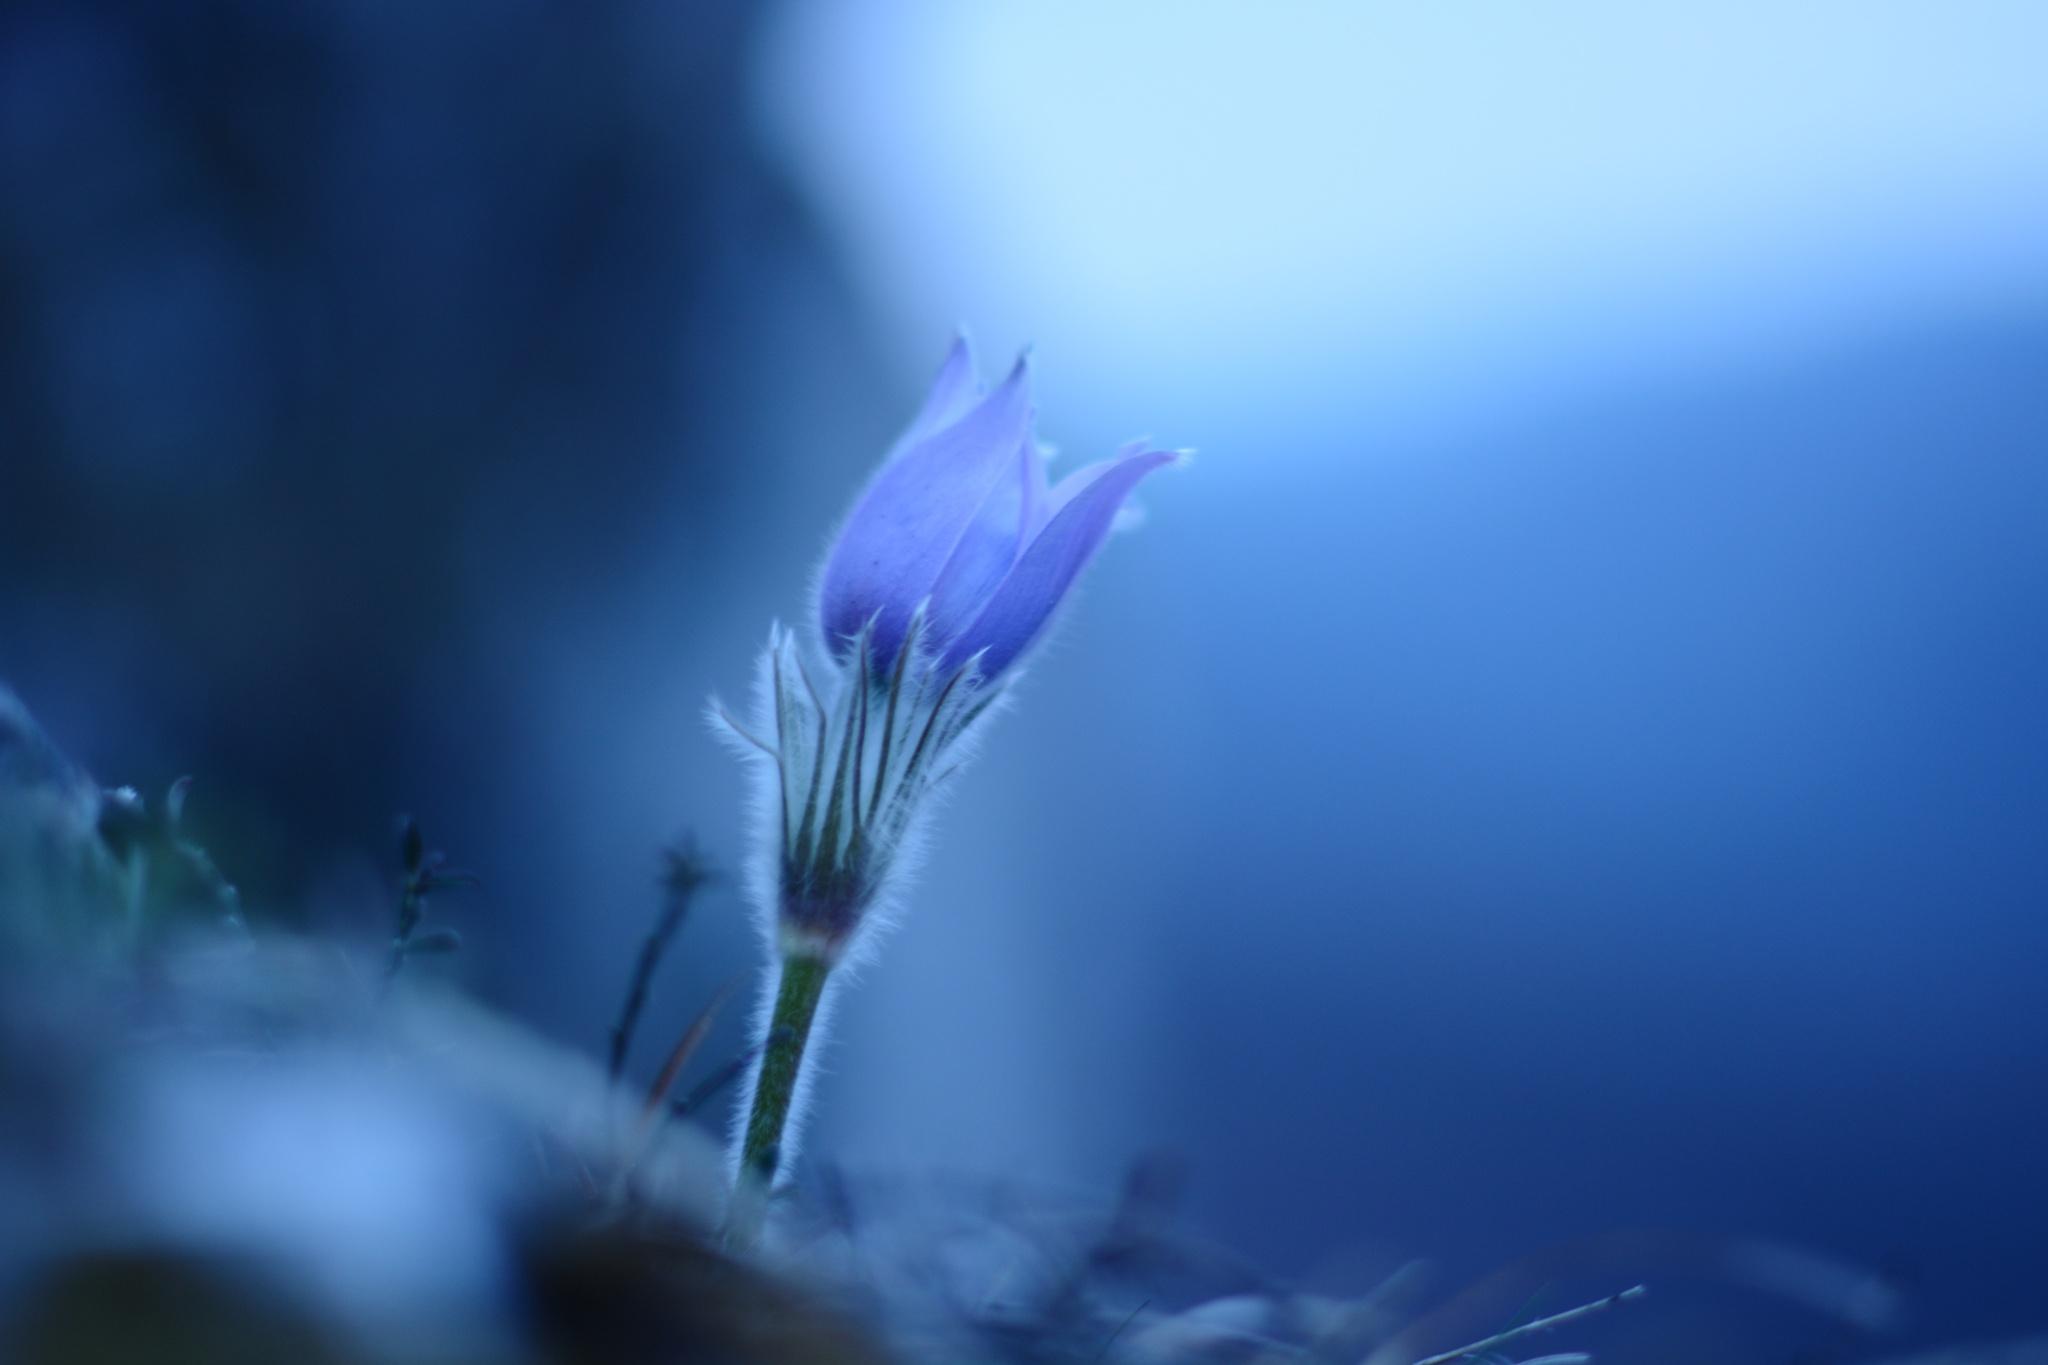 Sneezing light by Herendy Adrienn